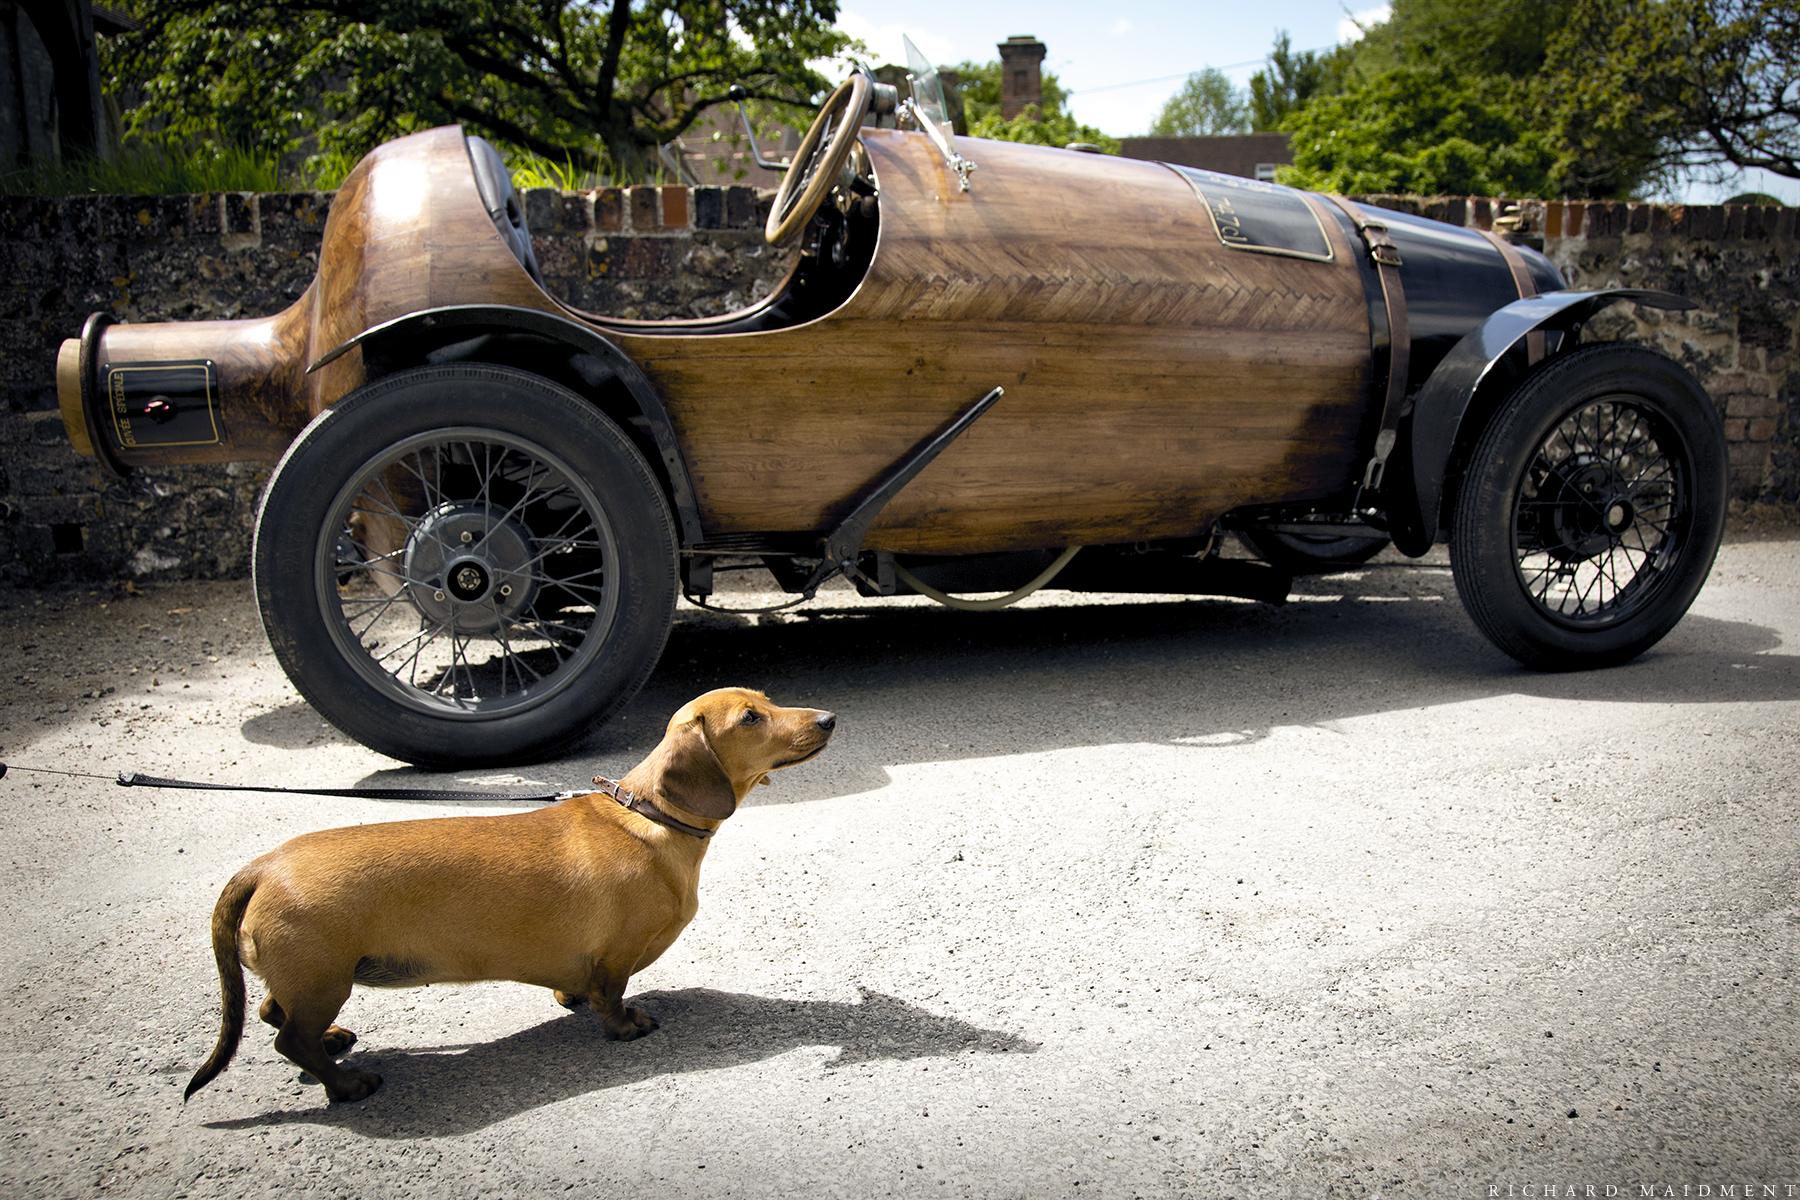 Richard Maidment - Wedding Photography (26).jpg